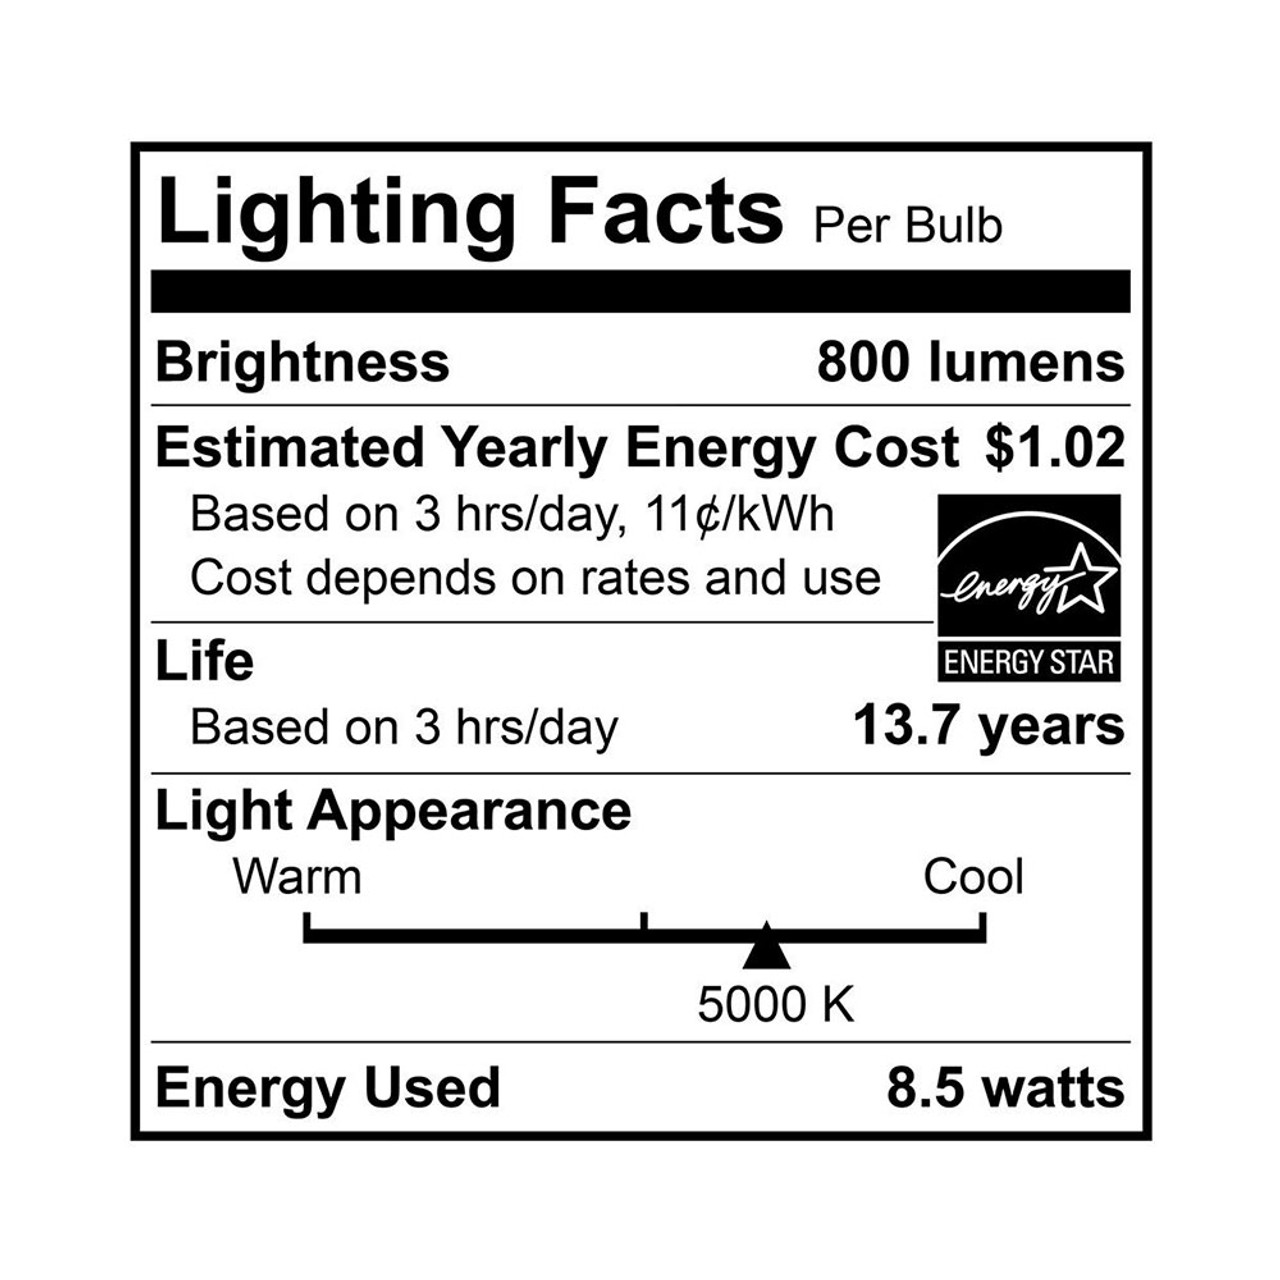 Lighting Facts